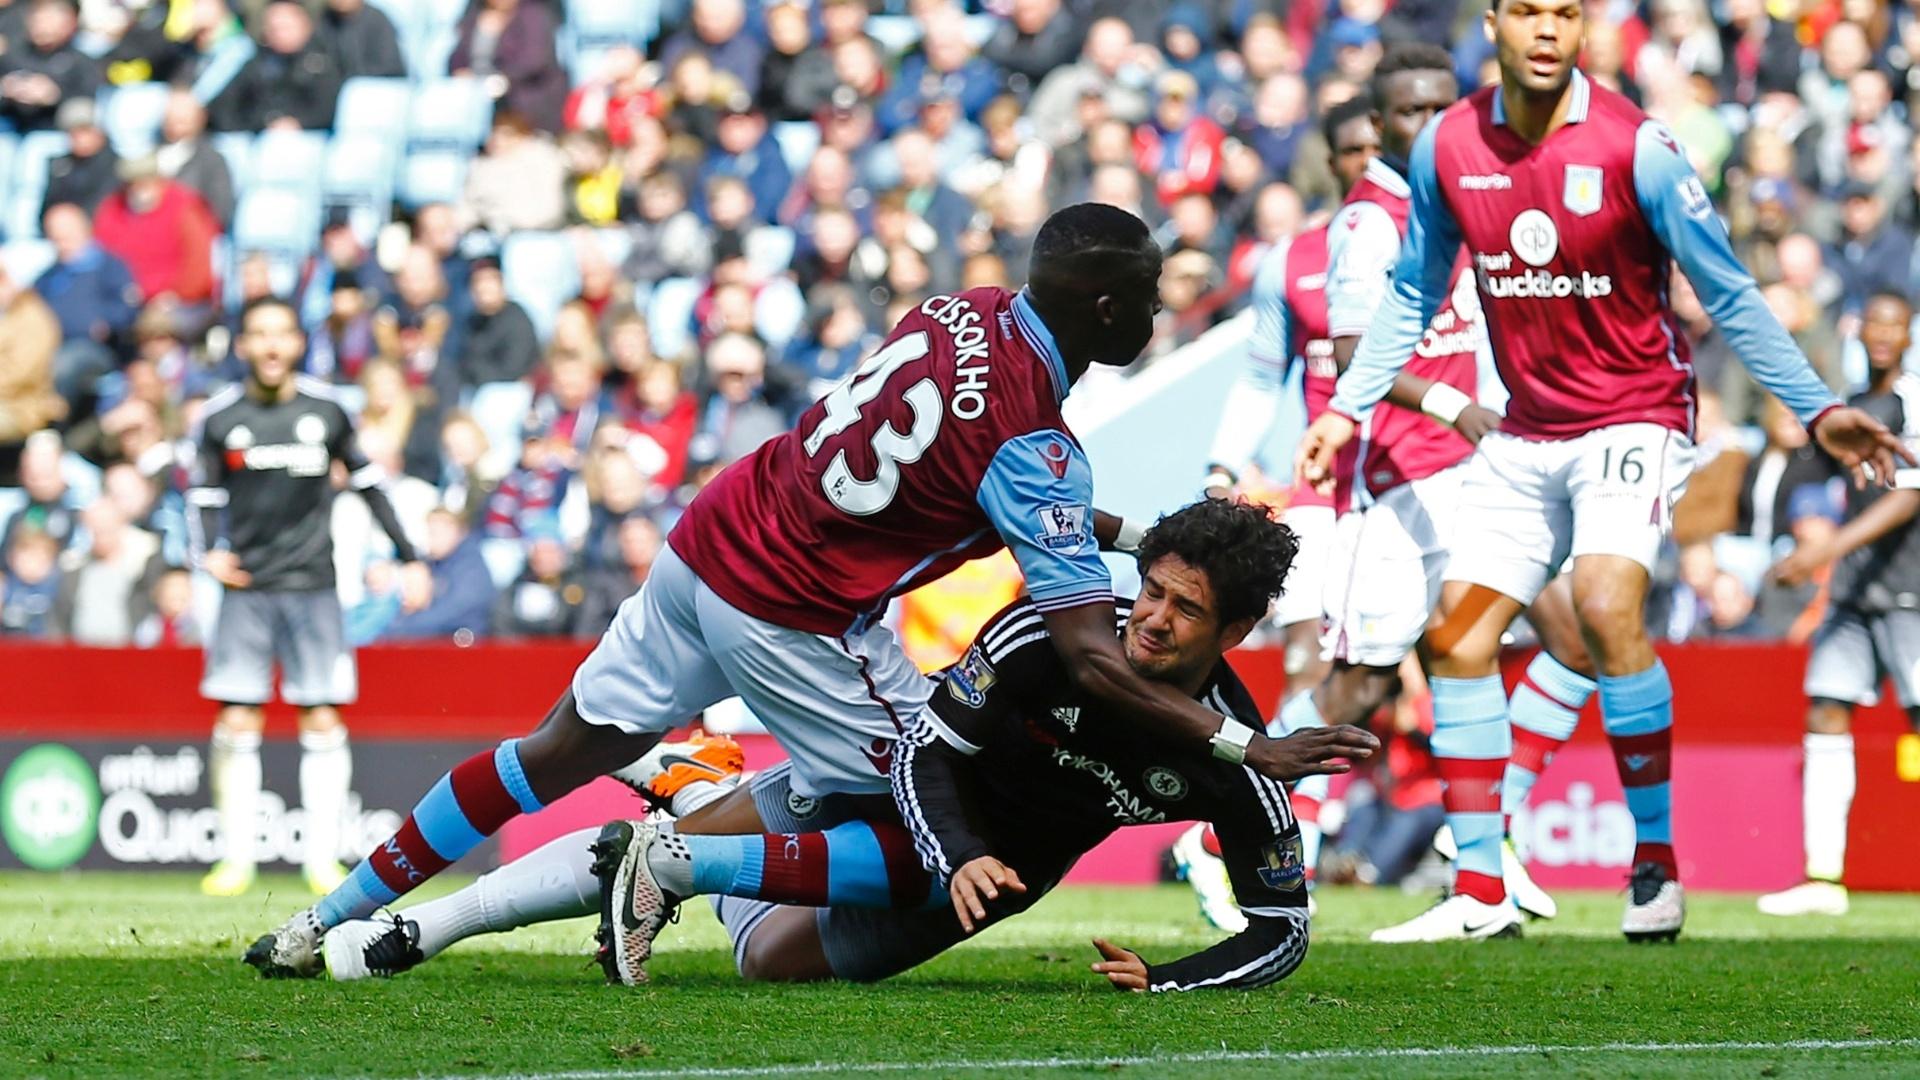 02.abr.2016 - Alexandre Pato, do Chelsea, sofre pênalti de Aly Cissokho, do Aston Villa